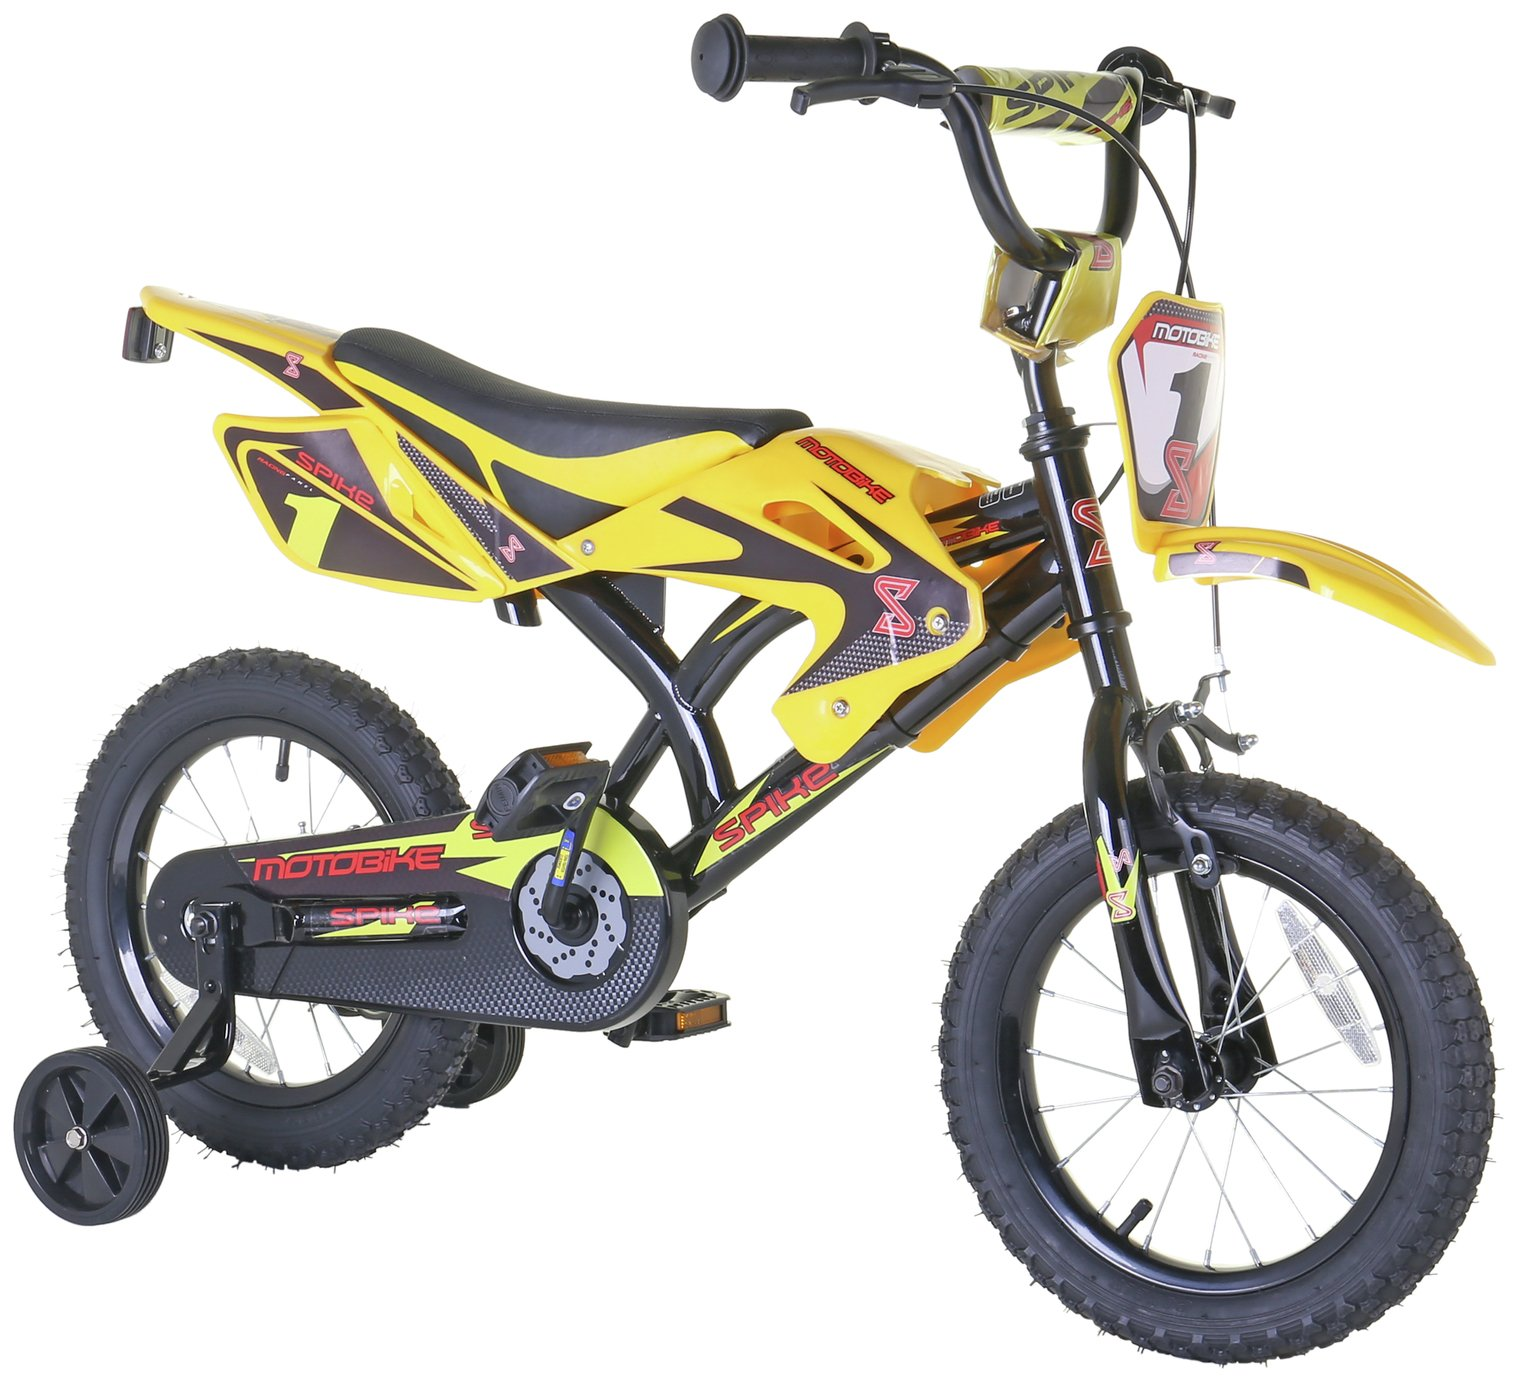 Spike 14 Inch Motorbike Style Kid's Bike